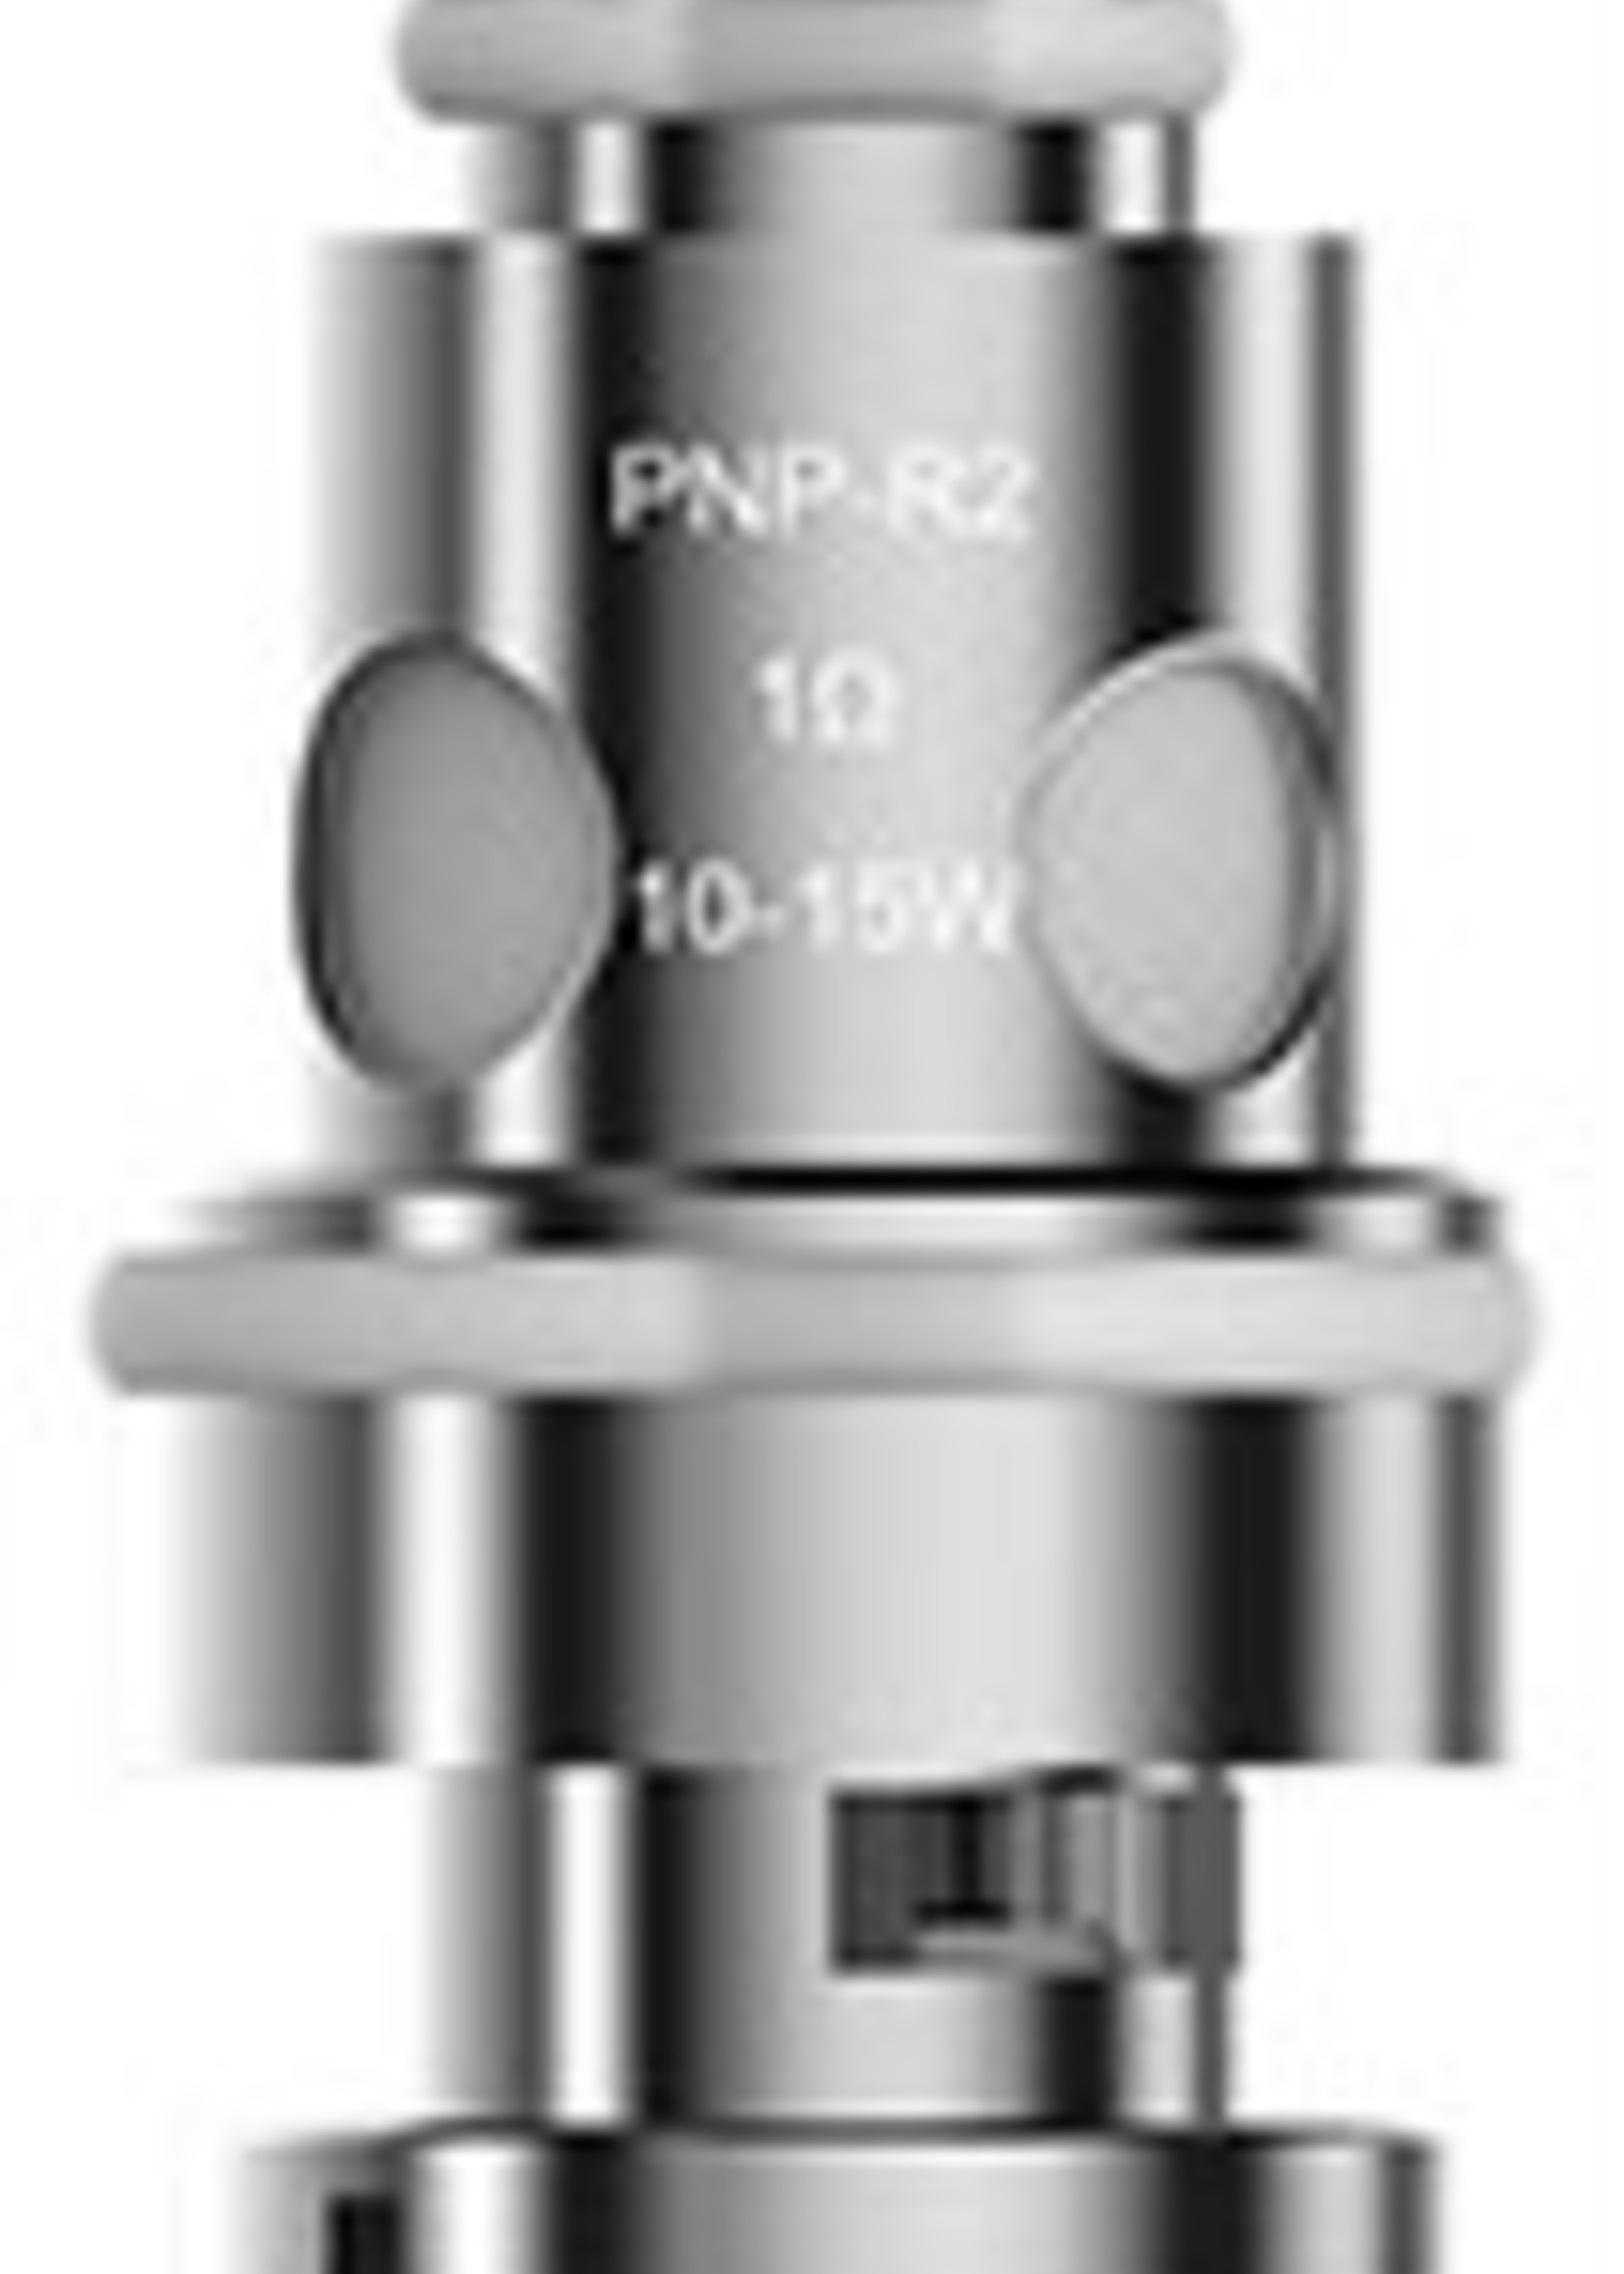 Voopoo Pnp R2 Coil - 1.0 Ohm